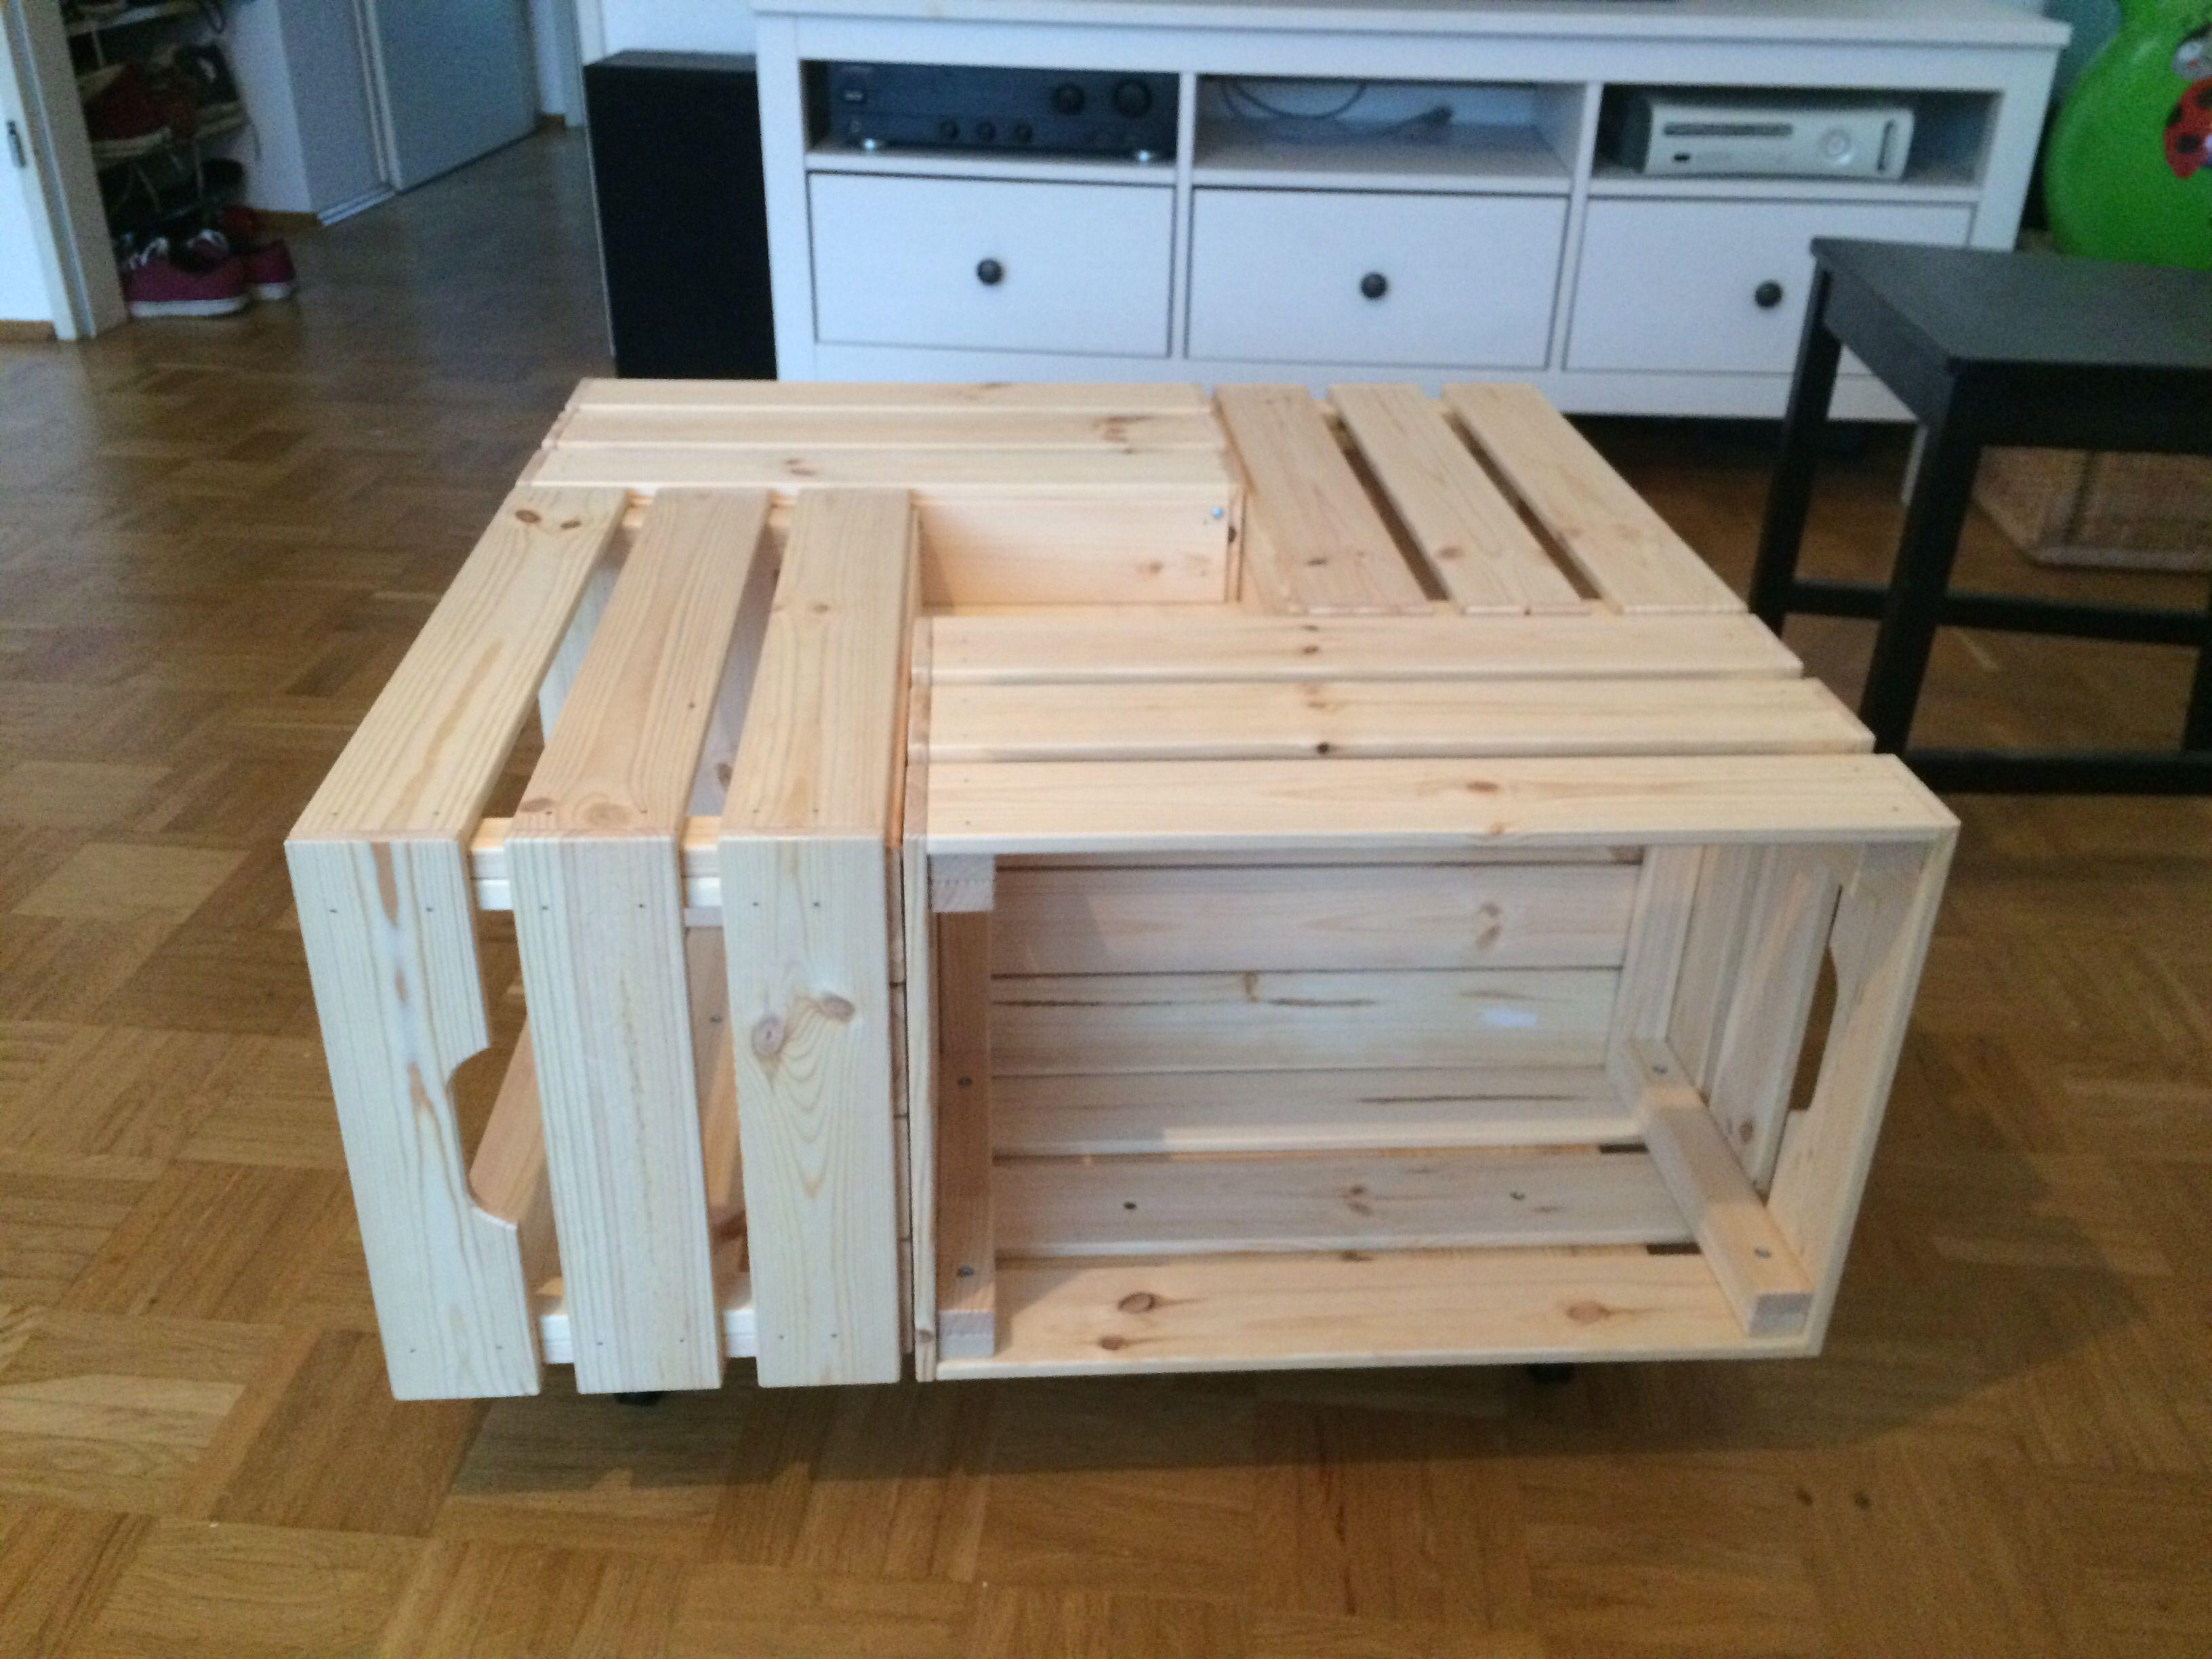 Knagglig Tisch Ikea Crates Crate Table Diy Furniture